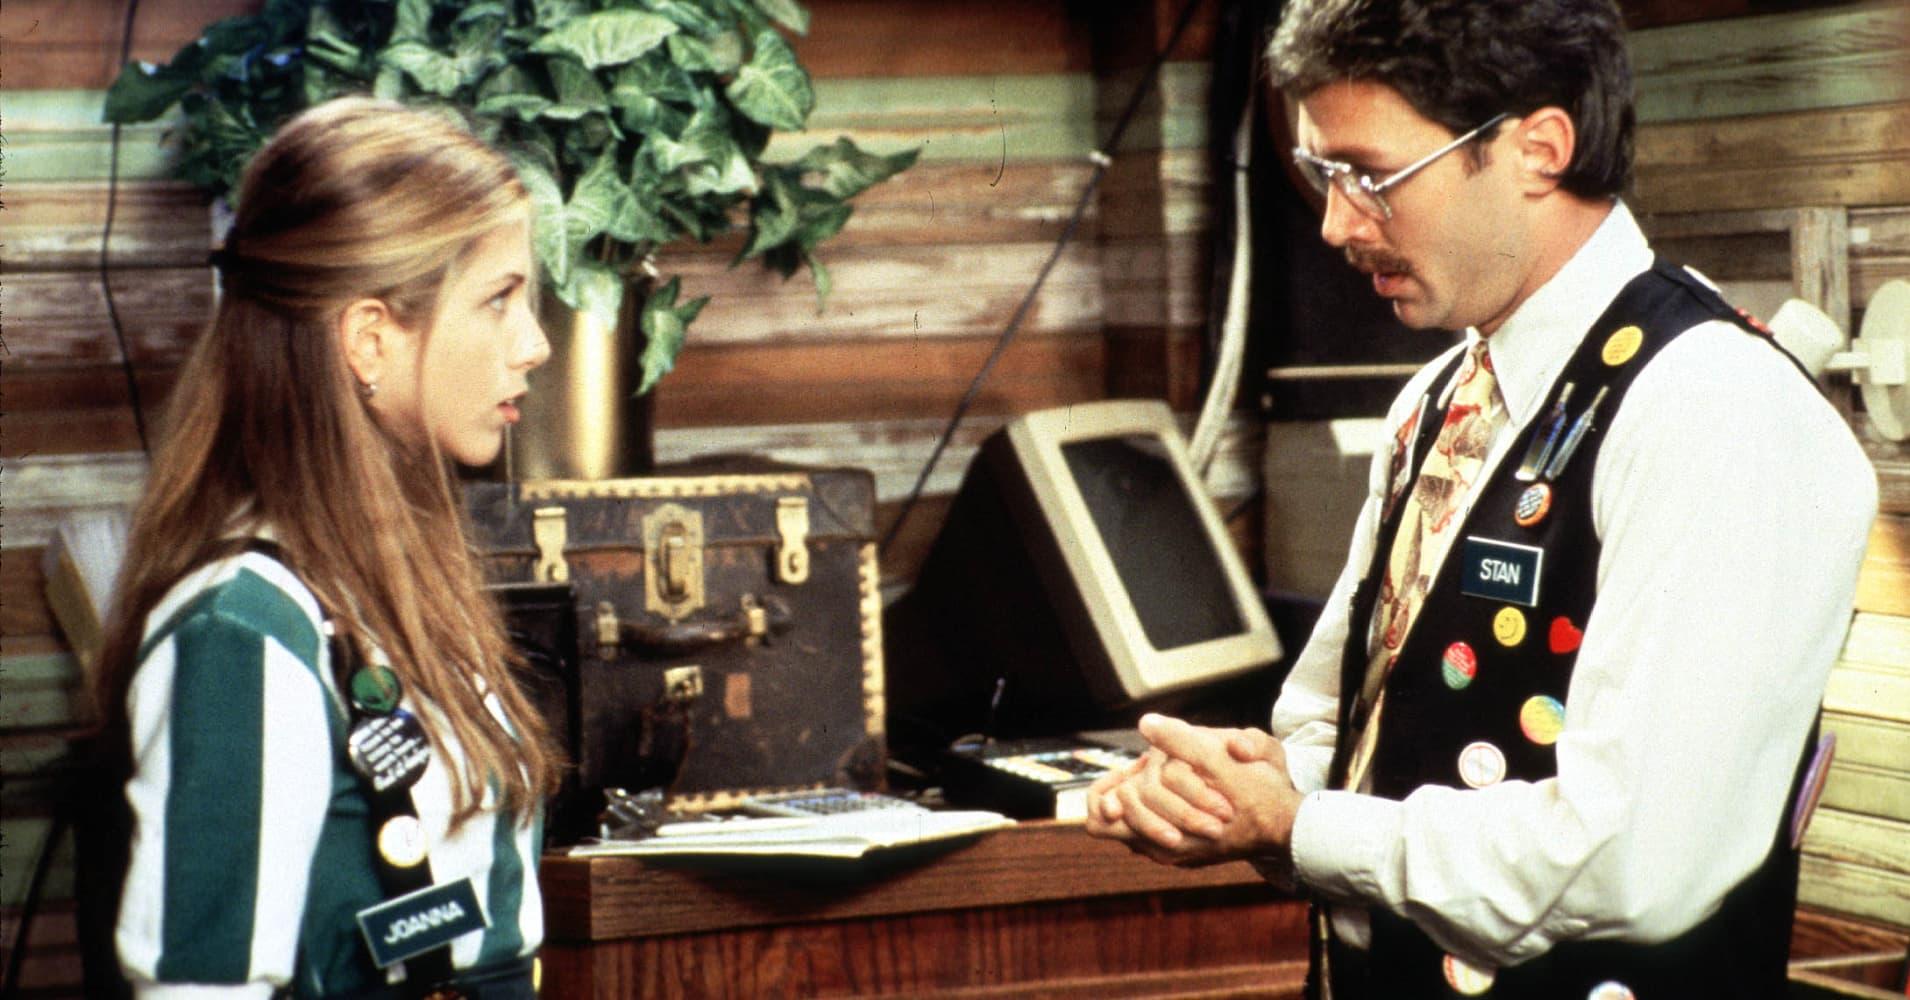 A scene of Twentieth Century Fox 'Office Space' with Jennifer Anniston